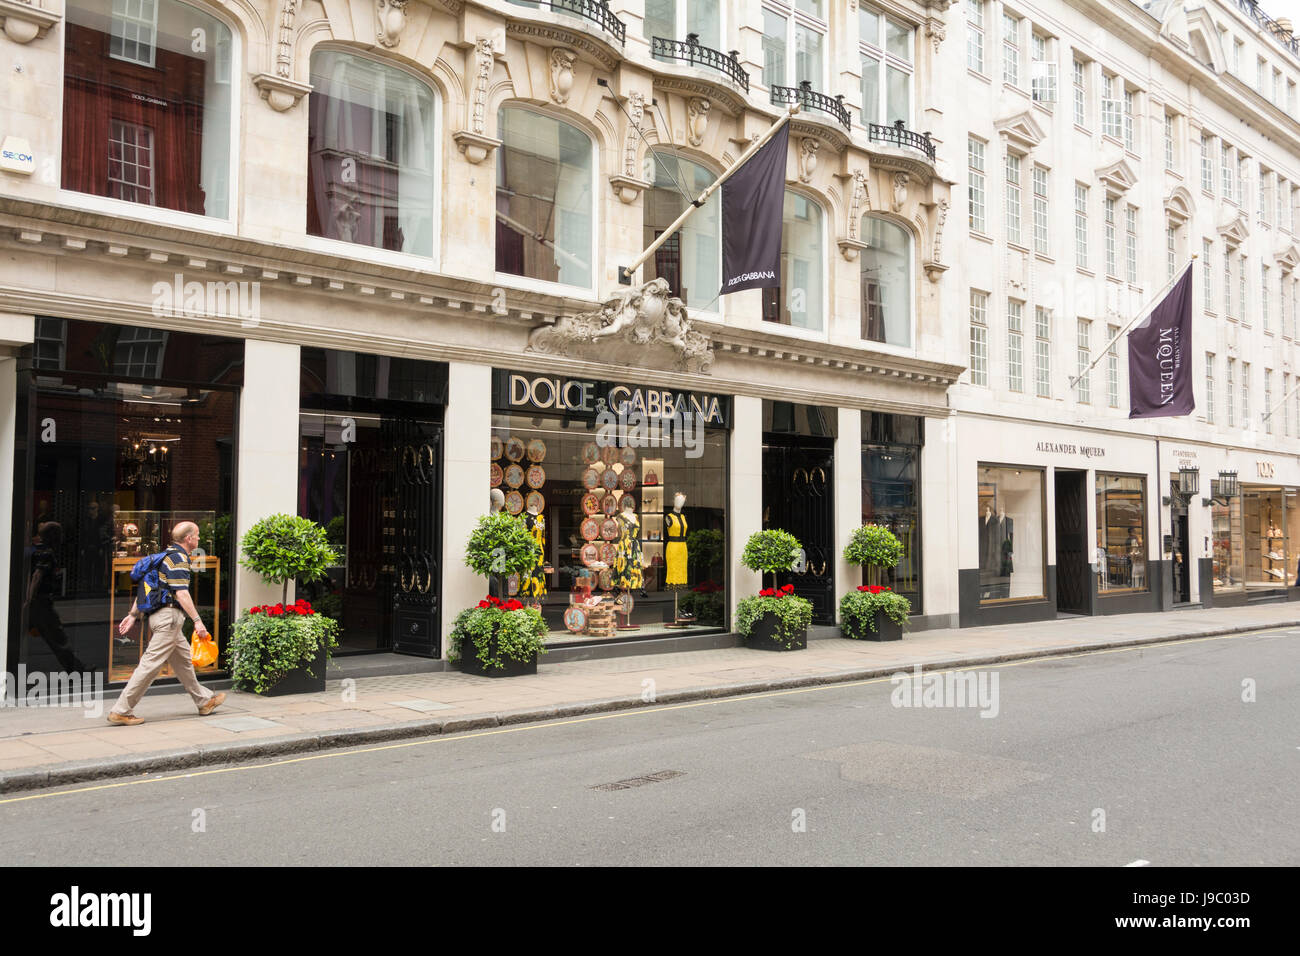 Dolce & Gabbana flagship store on New Bond Street, London, UK - Stock Image